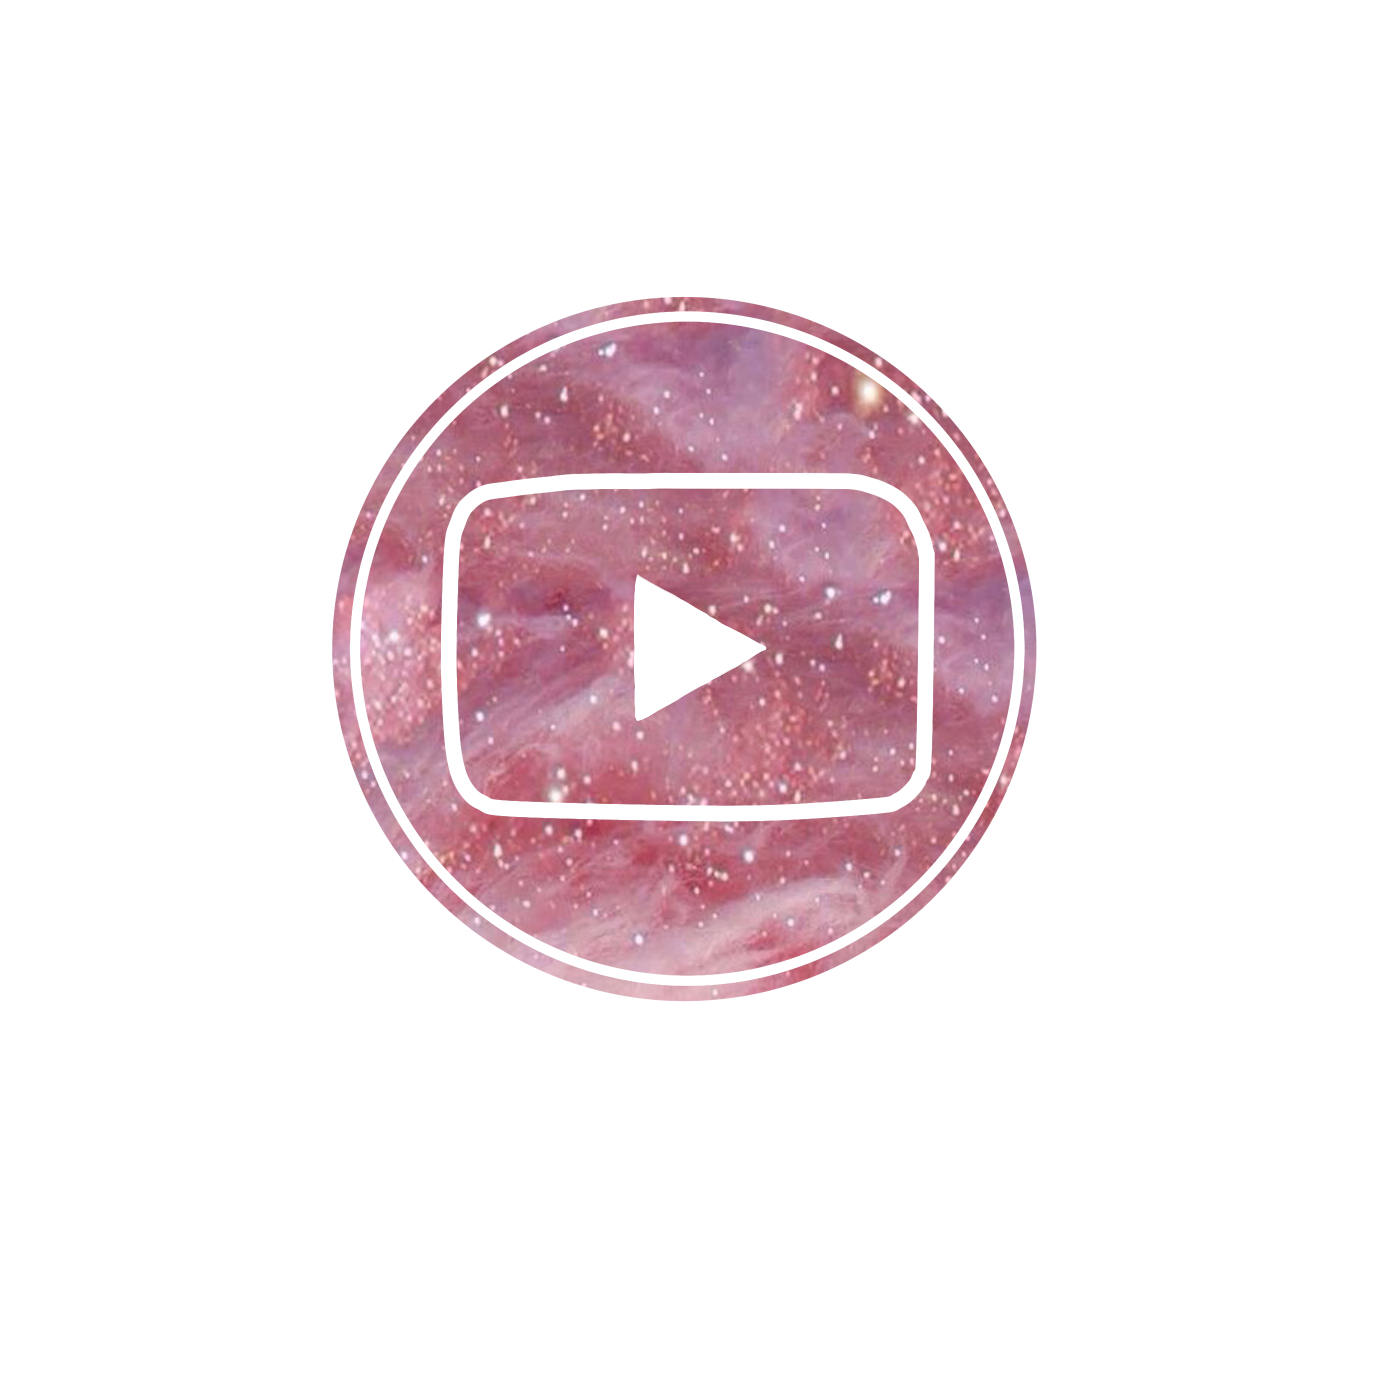 Youtube Icon Aesthetic Iphone Wallpaper Tumblr Aesthetic App Icon Design Cute App